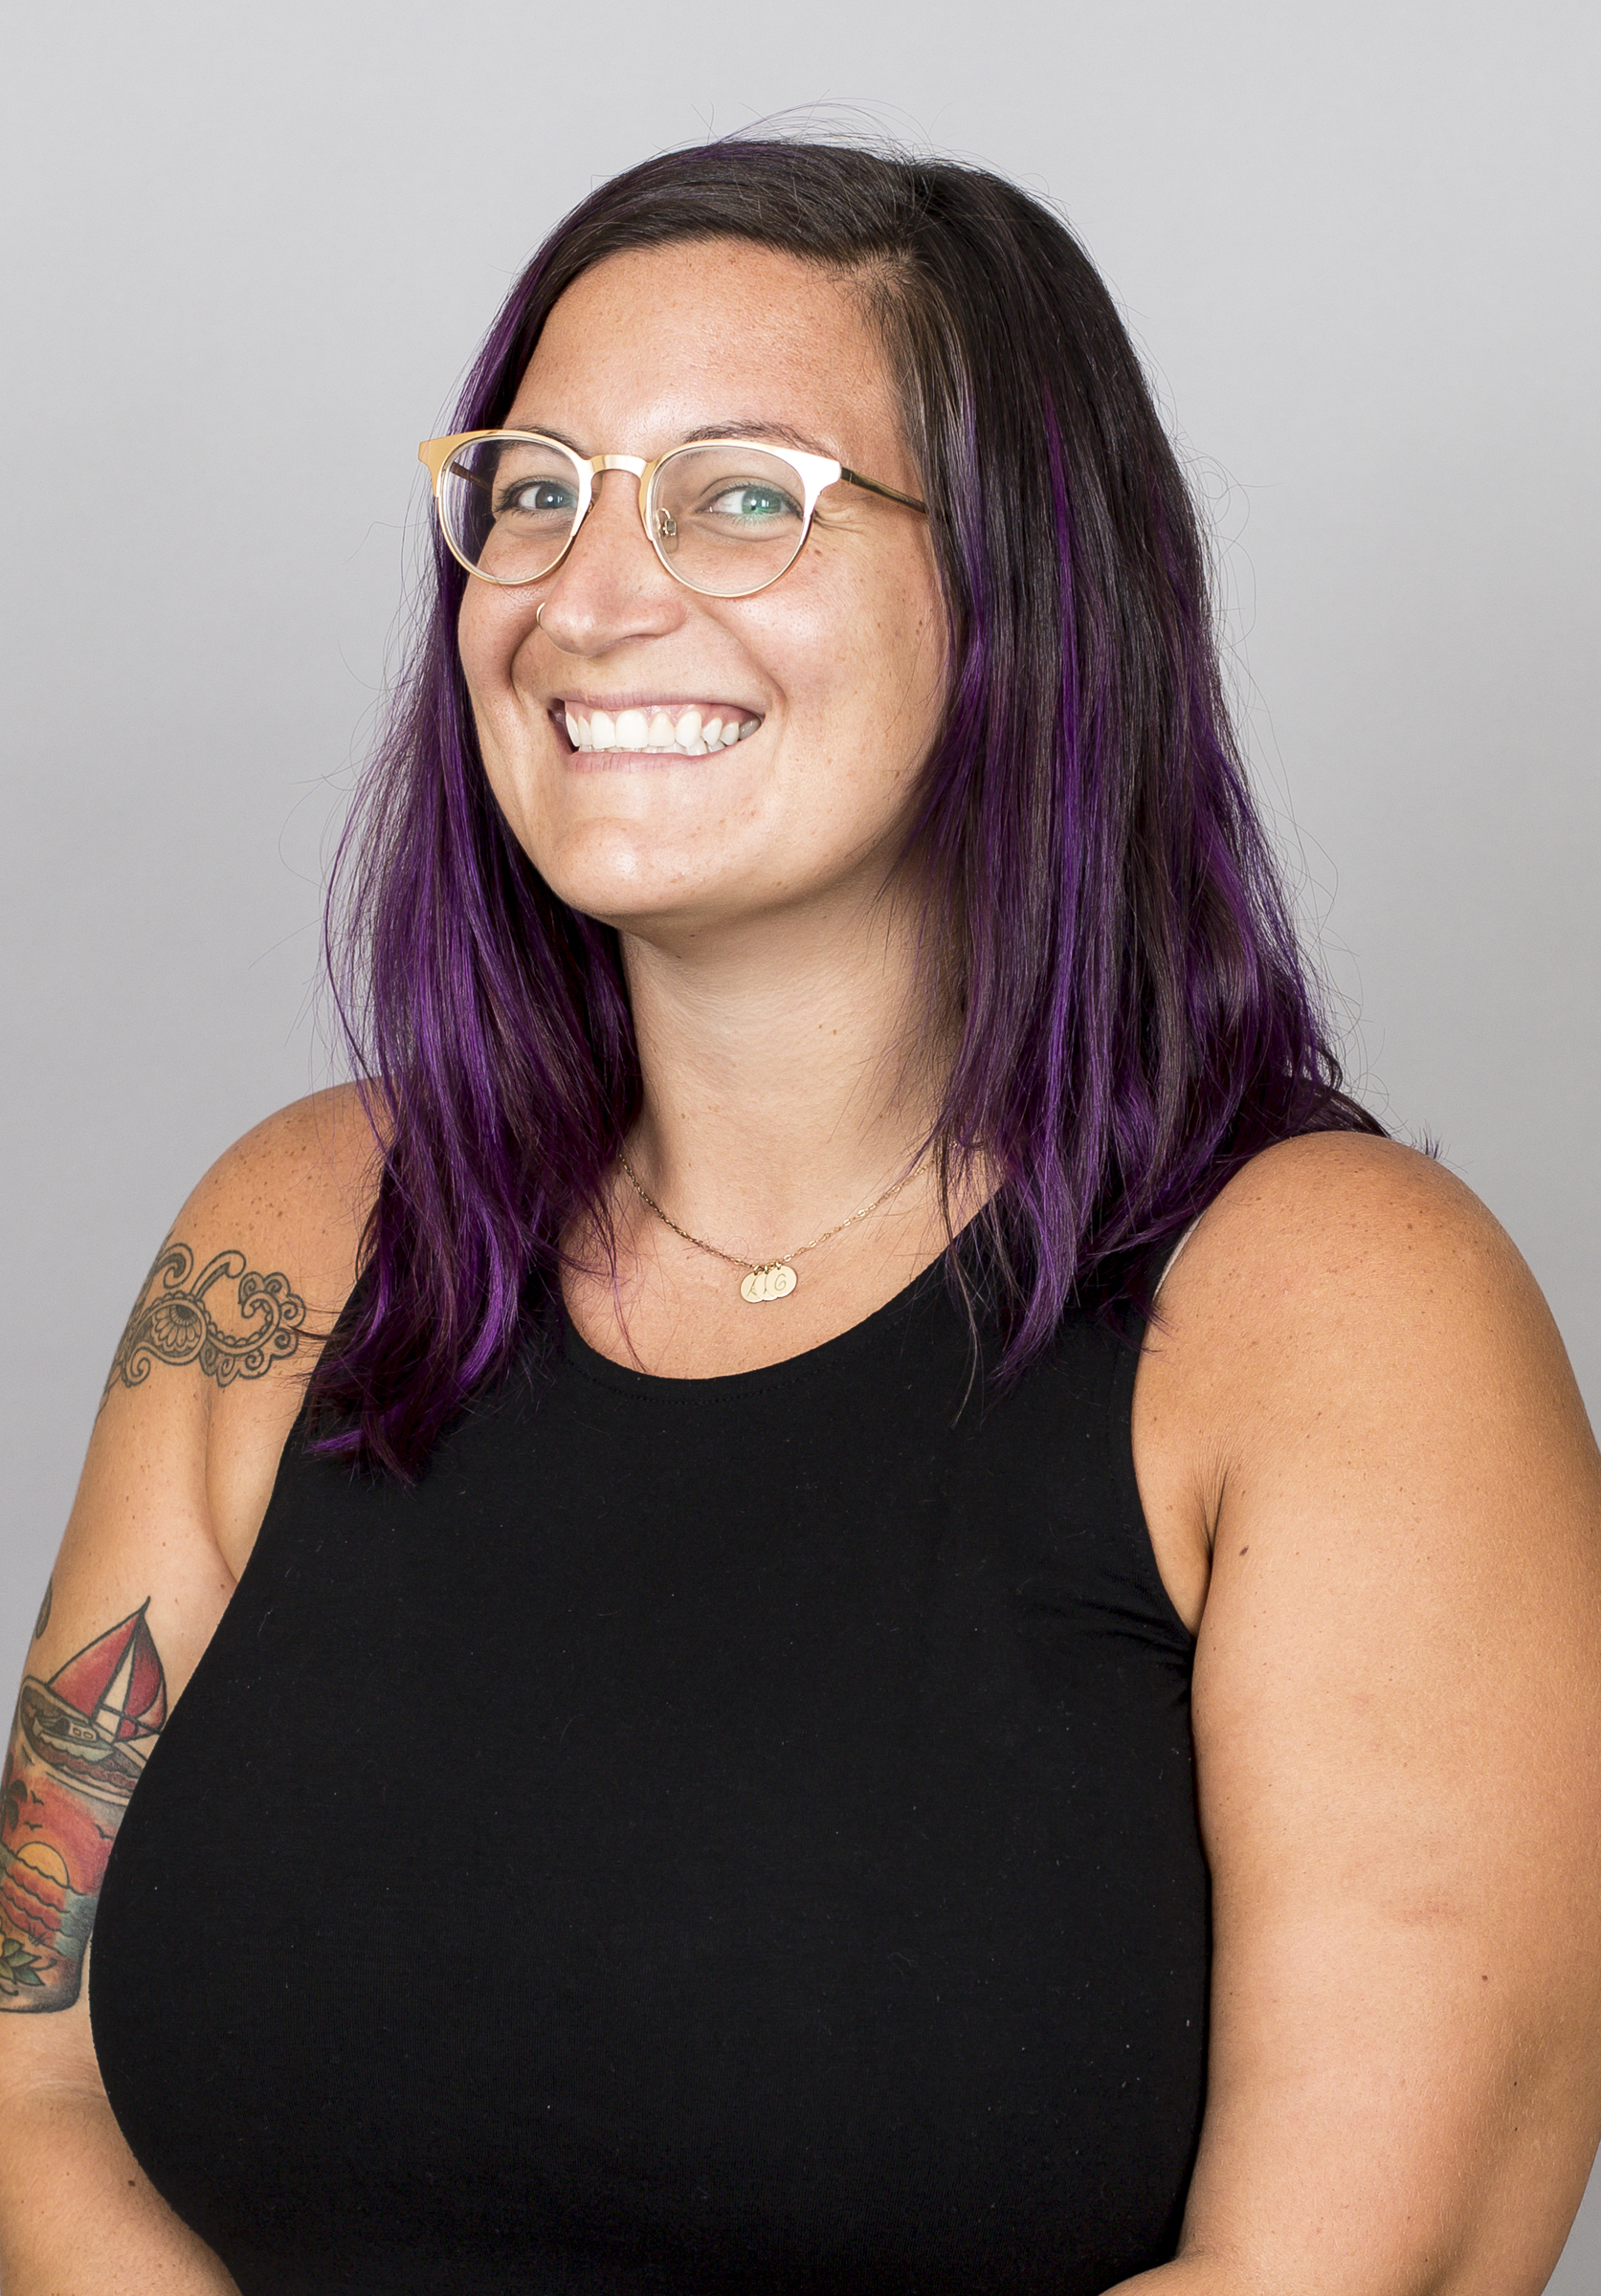 Kayla White - MASTER TEACHER, MATHEMATICSfreemk01@umd.edu